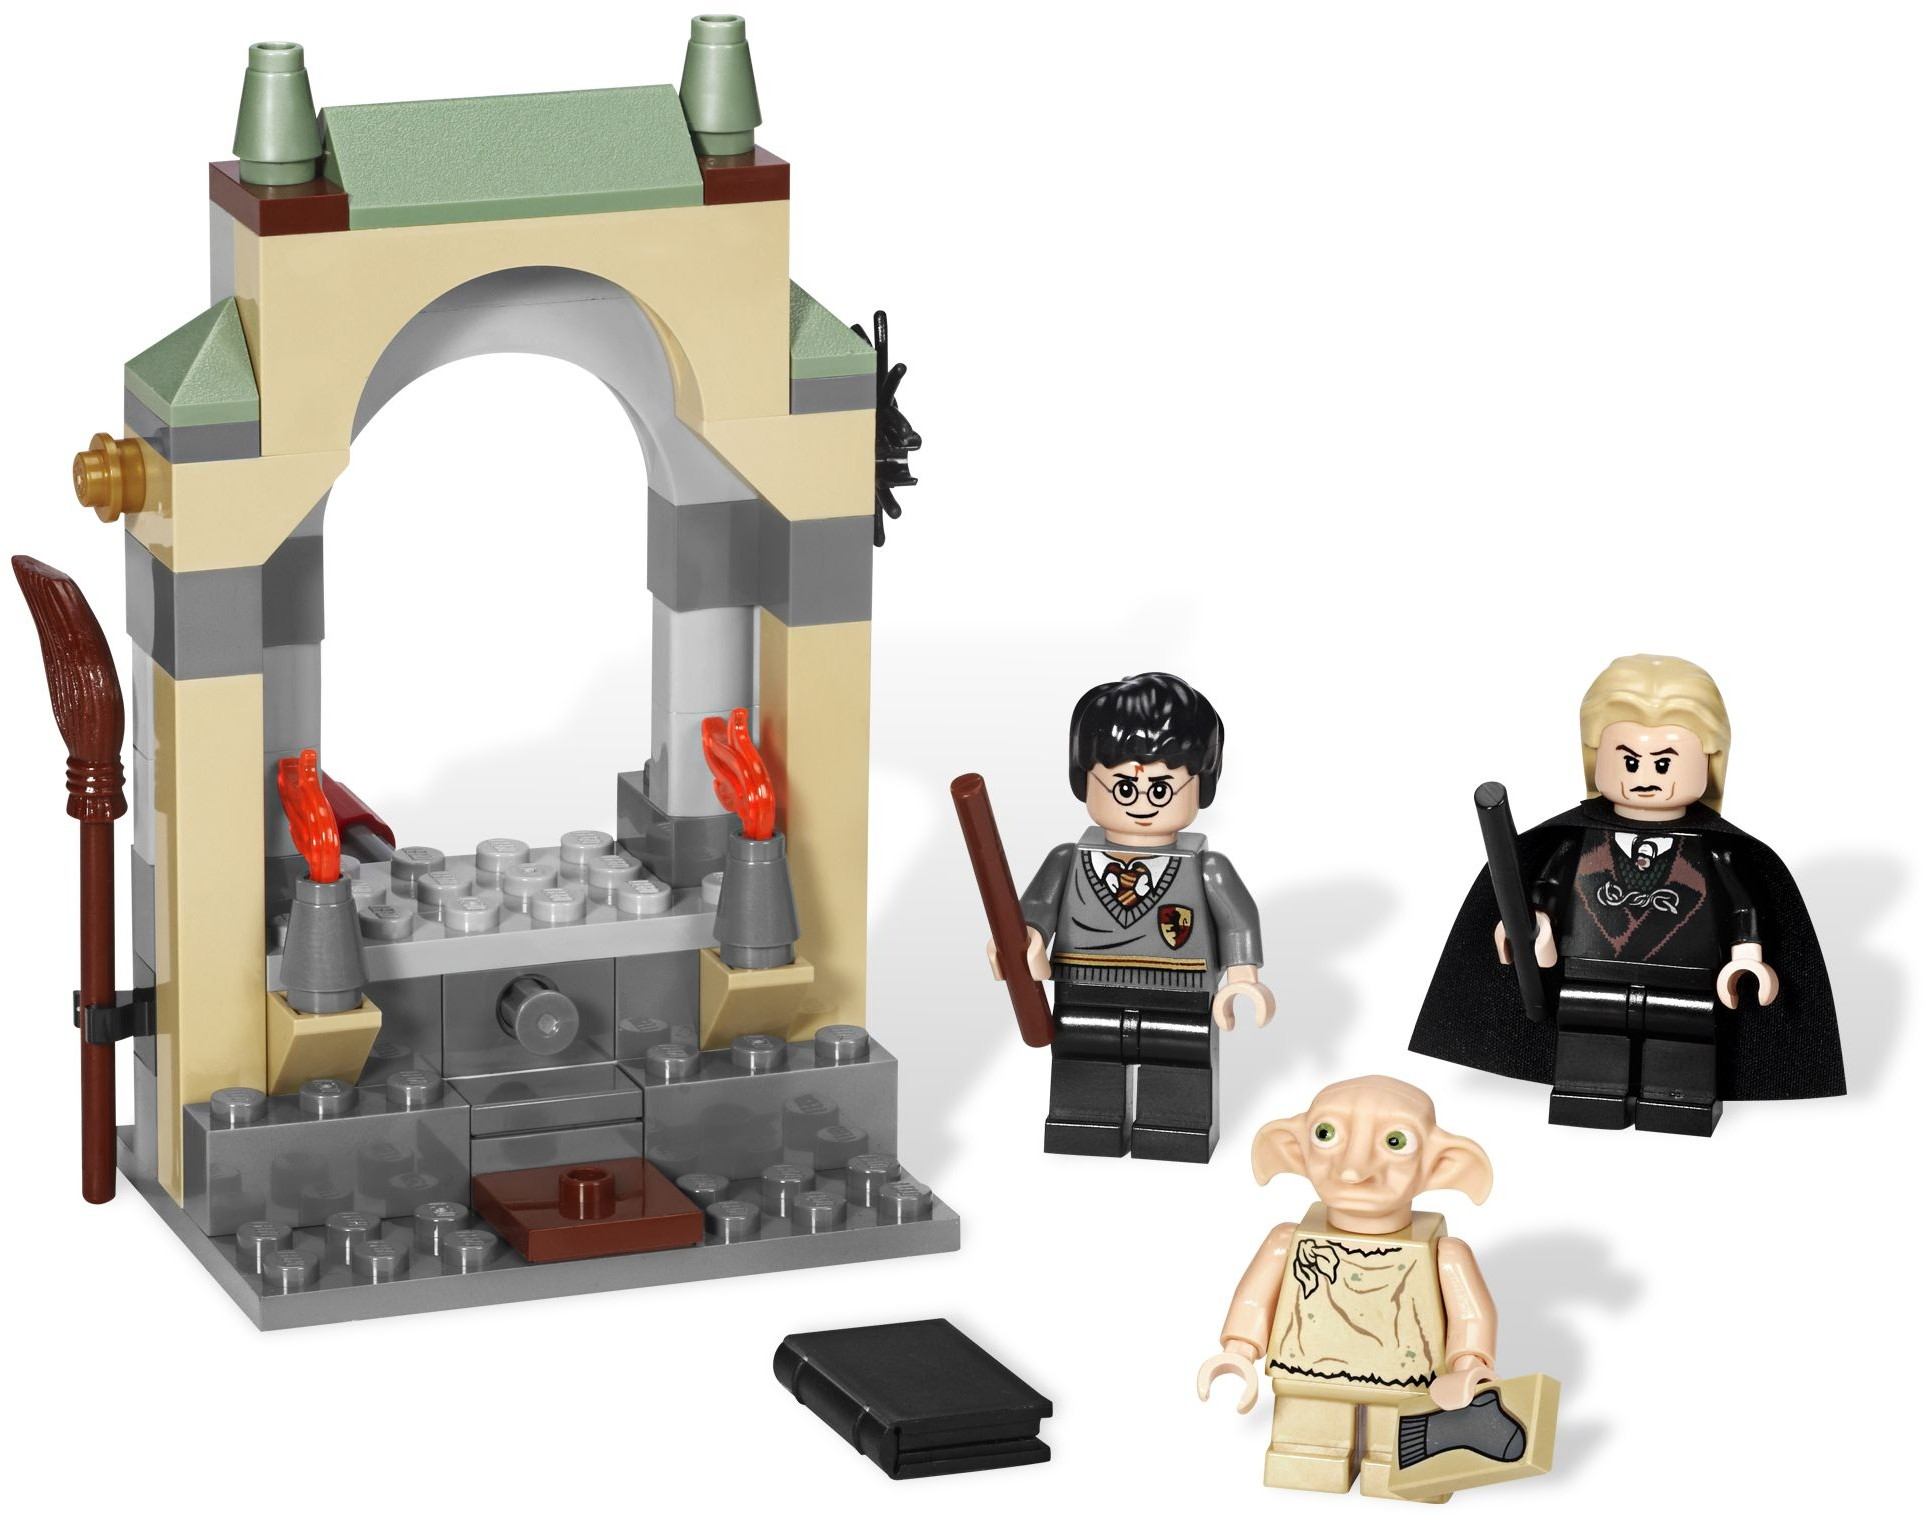 Harry Potter 2010 Brickset Lego Set Guide And Database